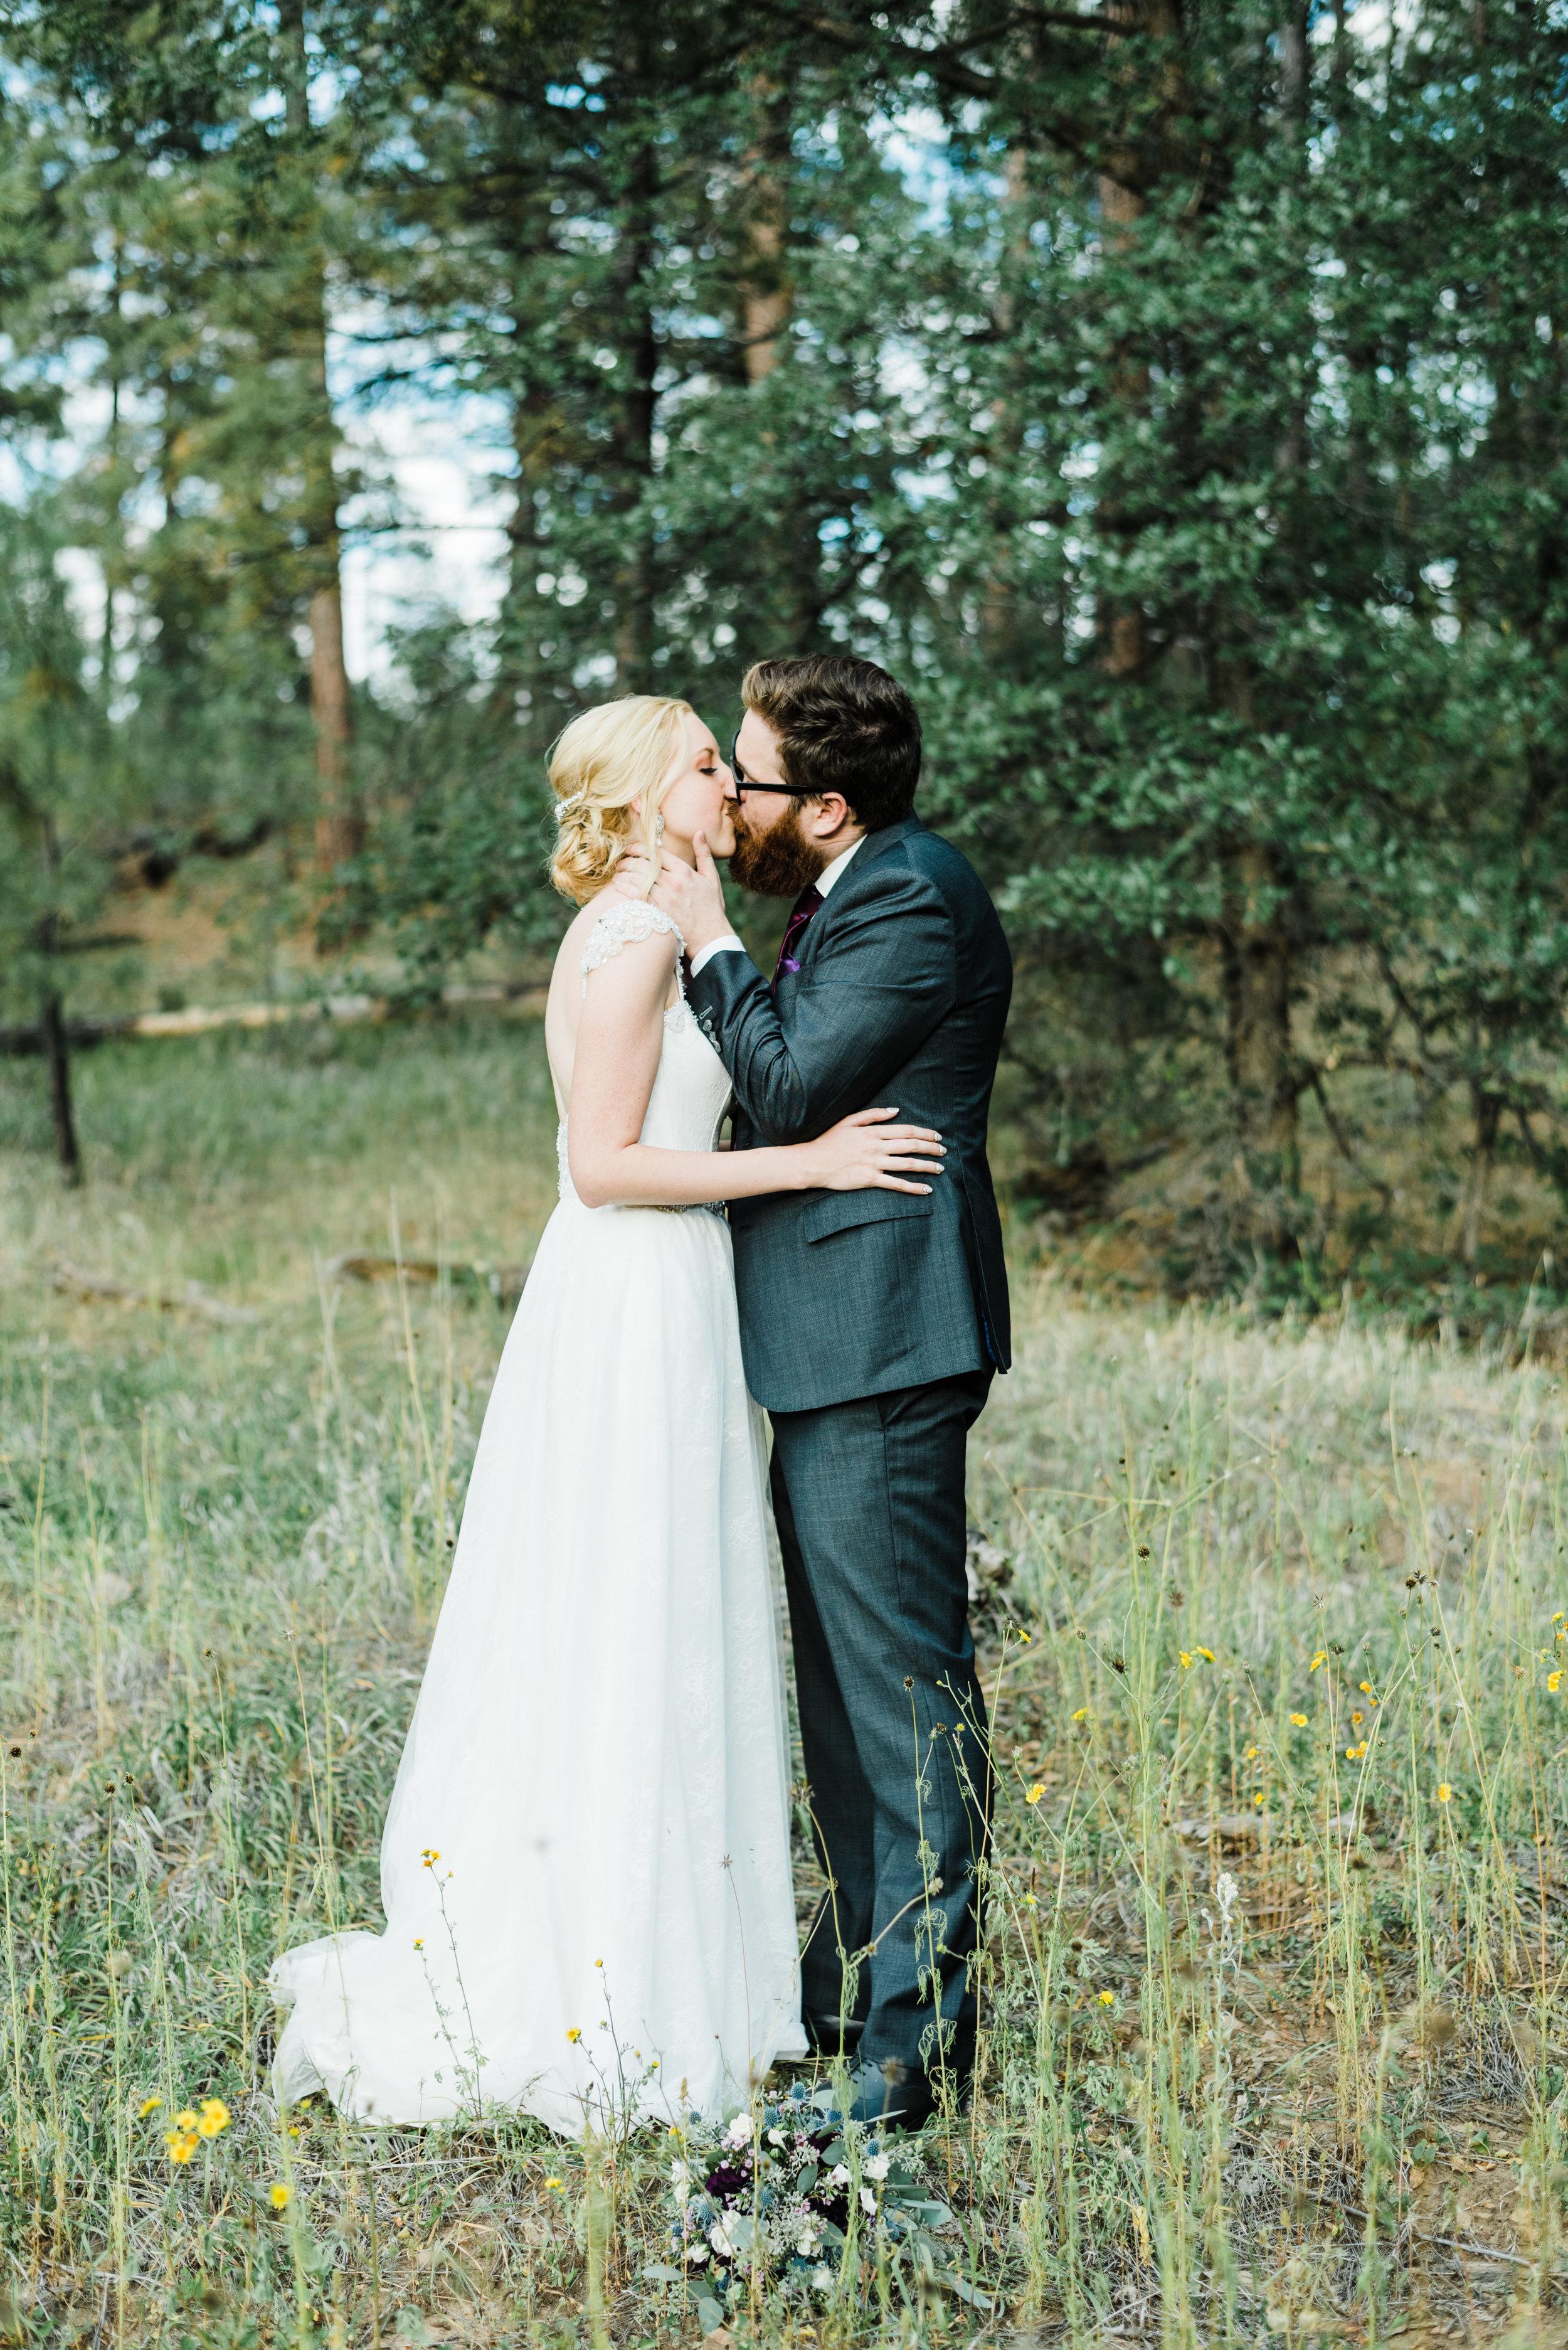 chelsea&tim.wedding-19.jpg